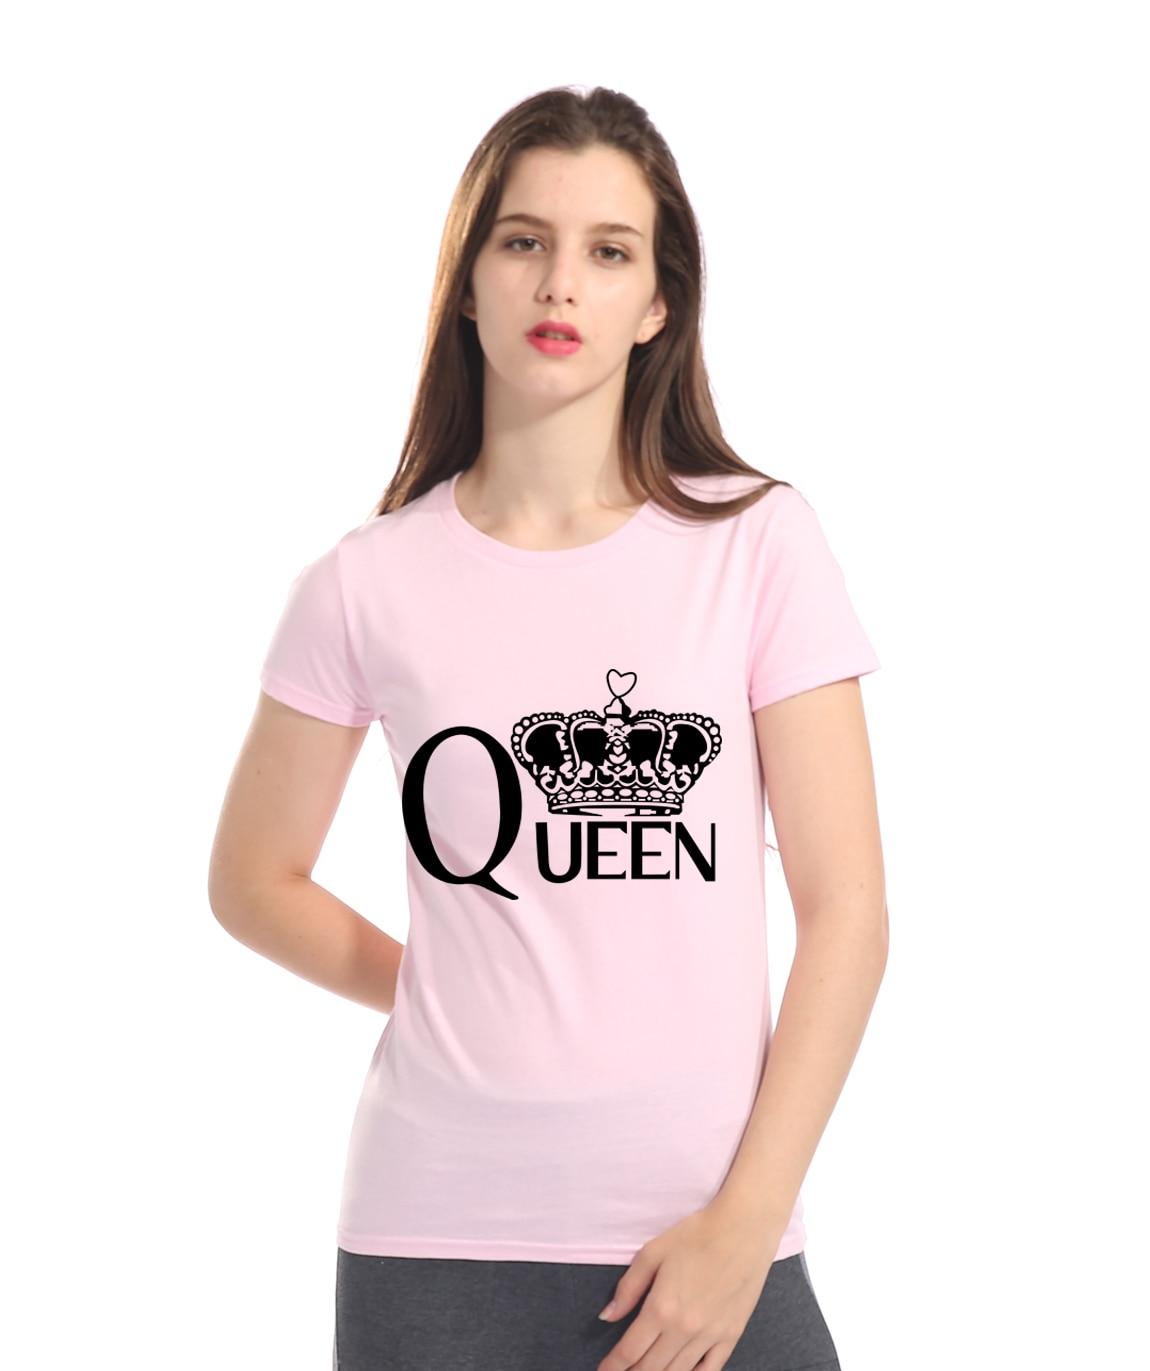 Gran oferta, verano 2018, camiseta de Reina, tops de mujer, camiseta harajuku de algodón de alta calidad, divertida camiseta femenina hip hop, S-XL